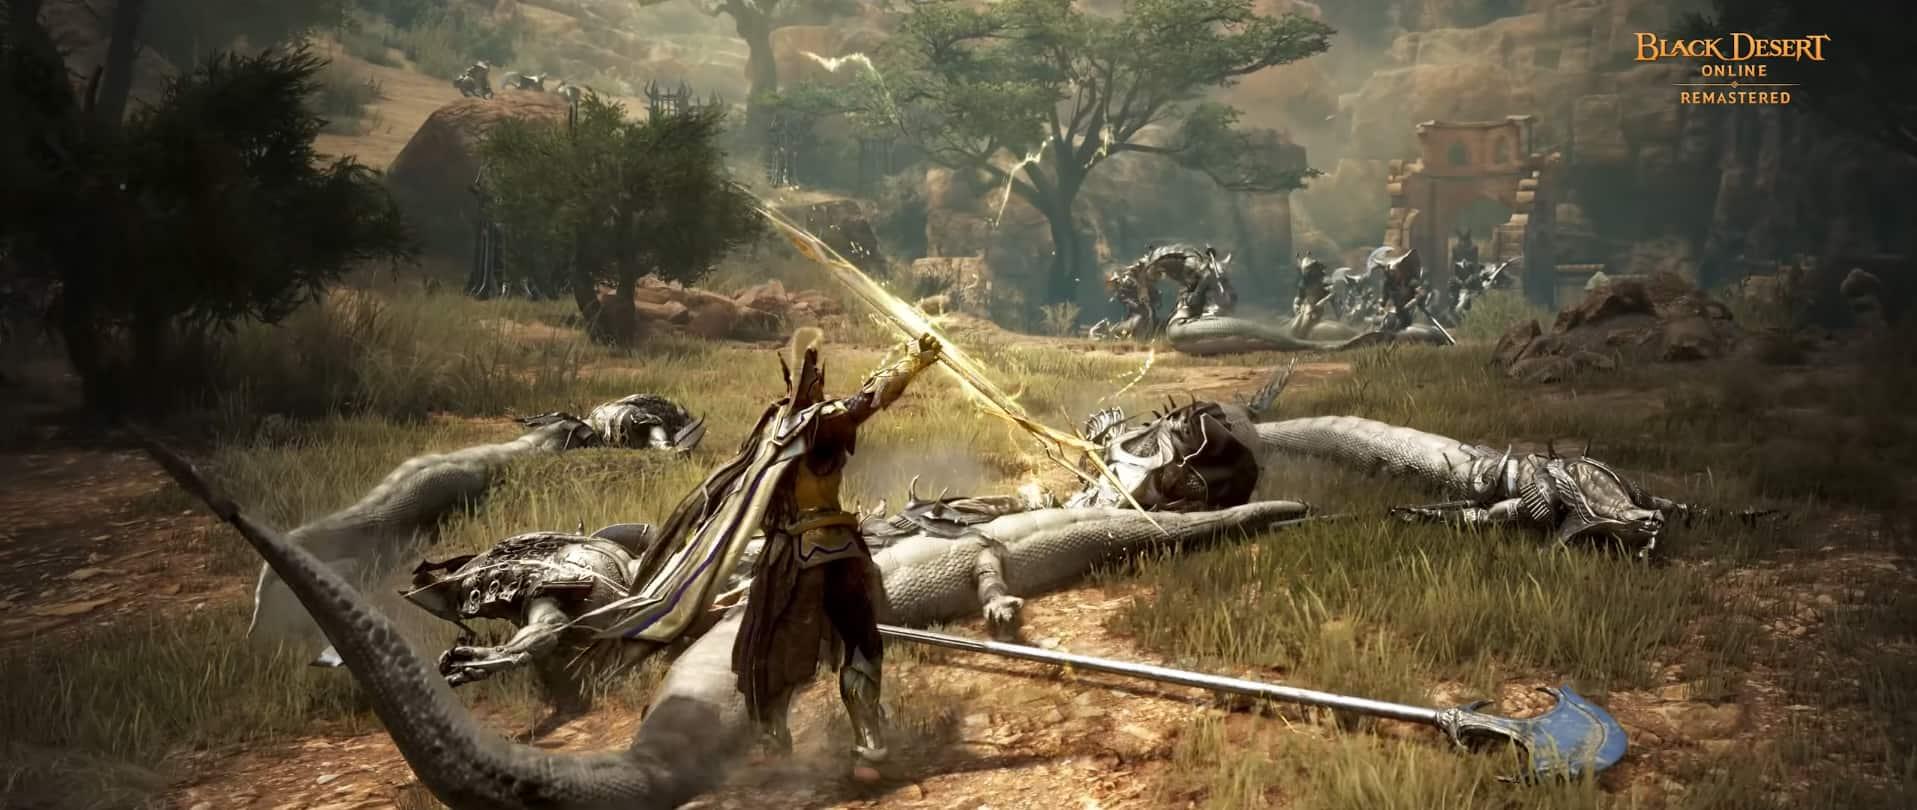 Black Desert Online Previews The Sage Awakening Coming April 21st 4